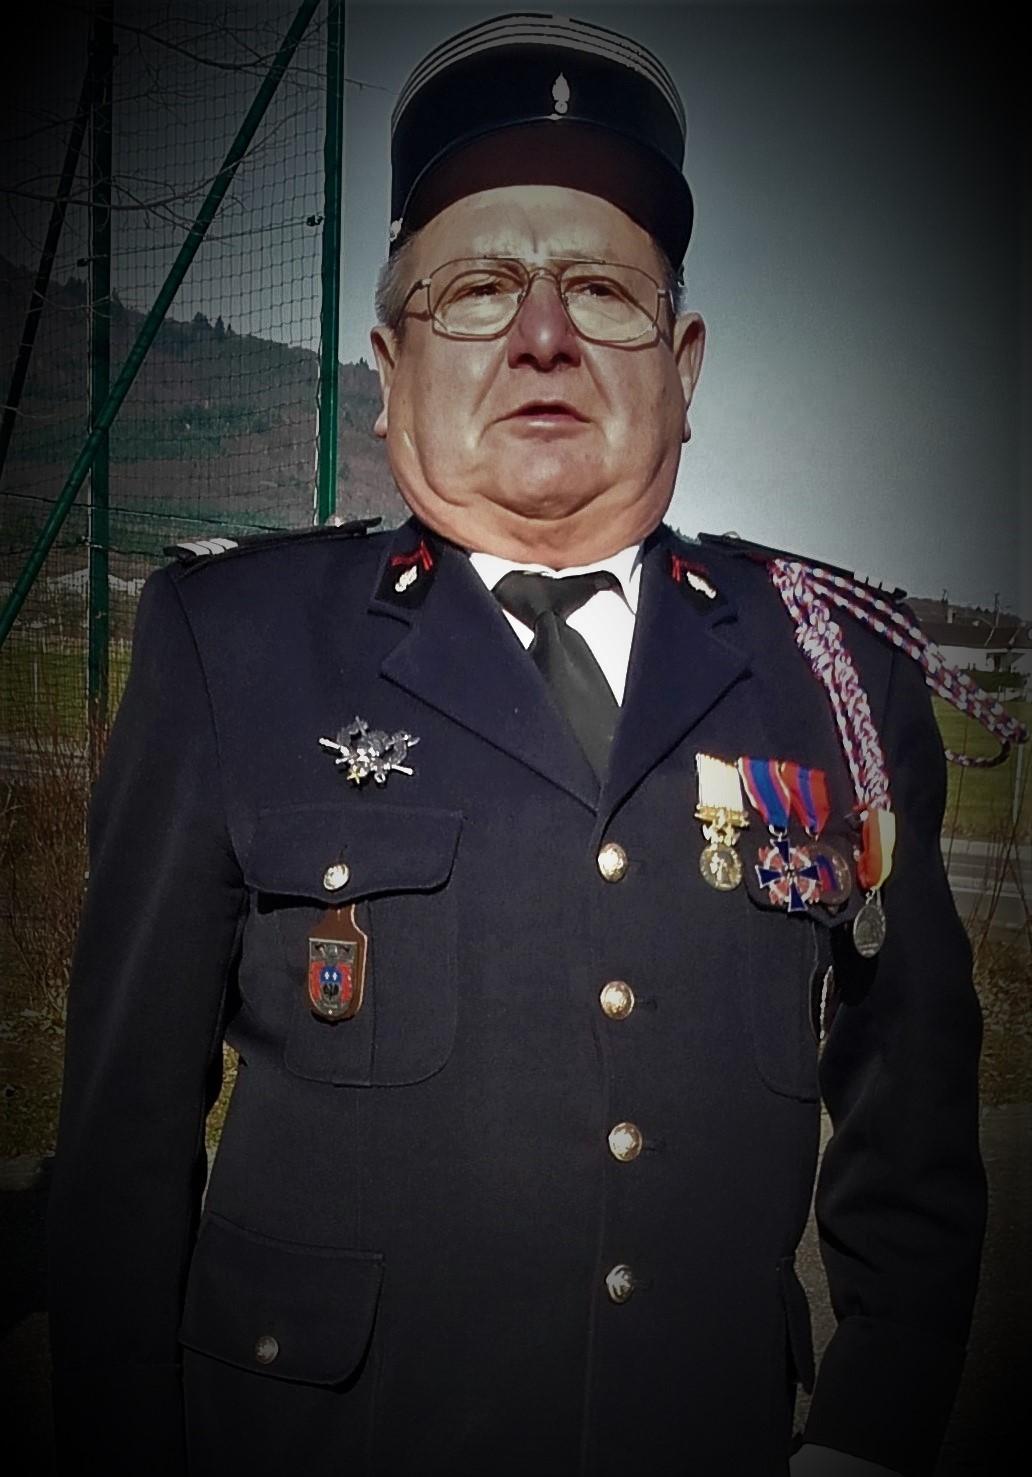 Capitaine Risacher 2.jpg